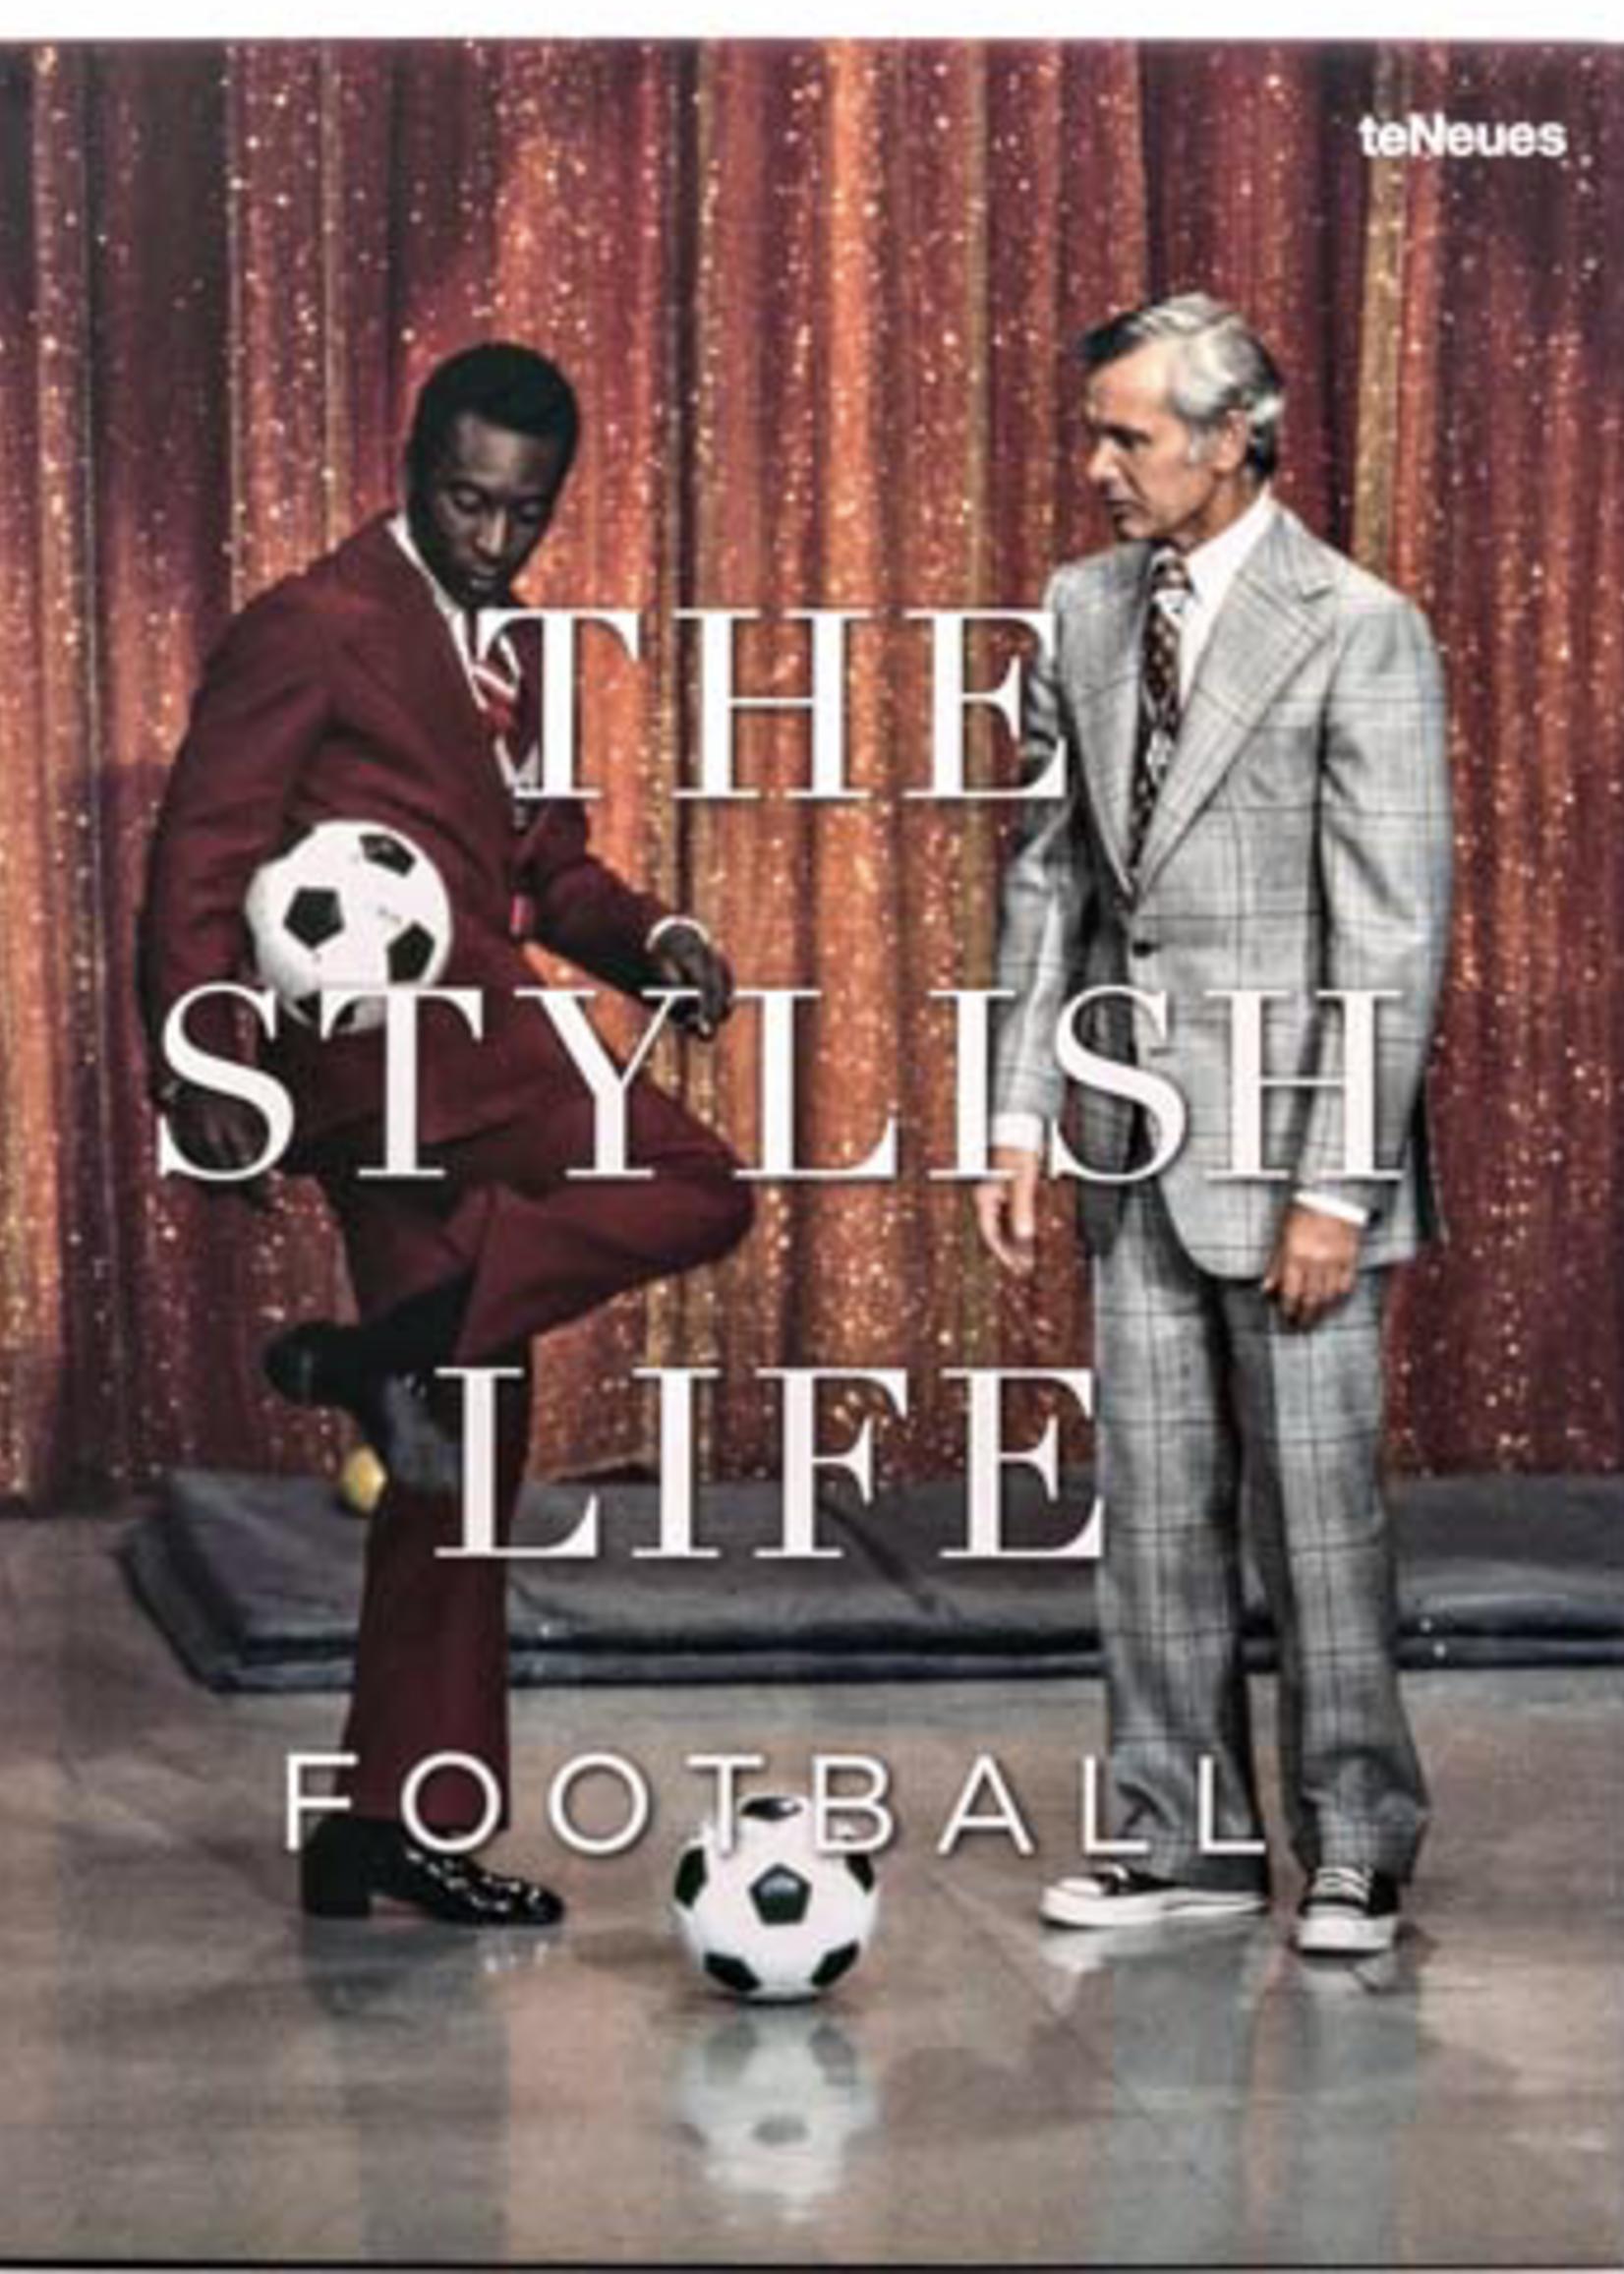 teNeues TeNeues Stylish Life: Football